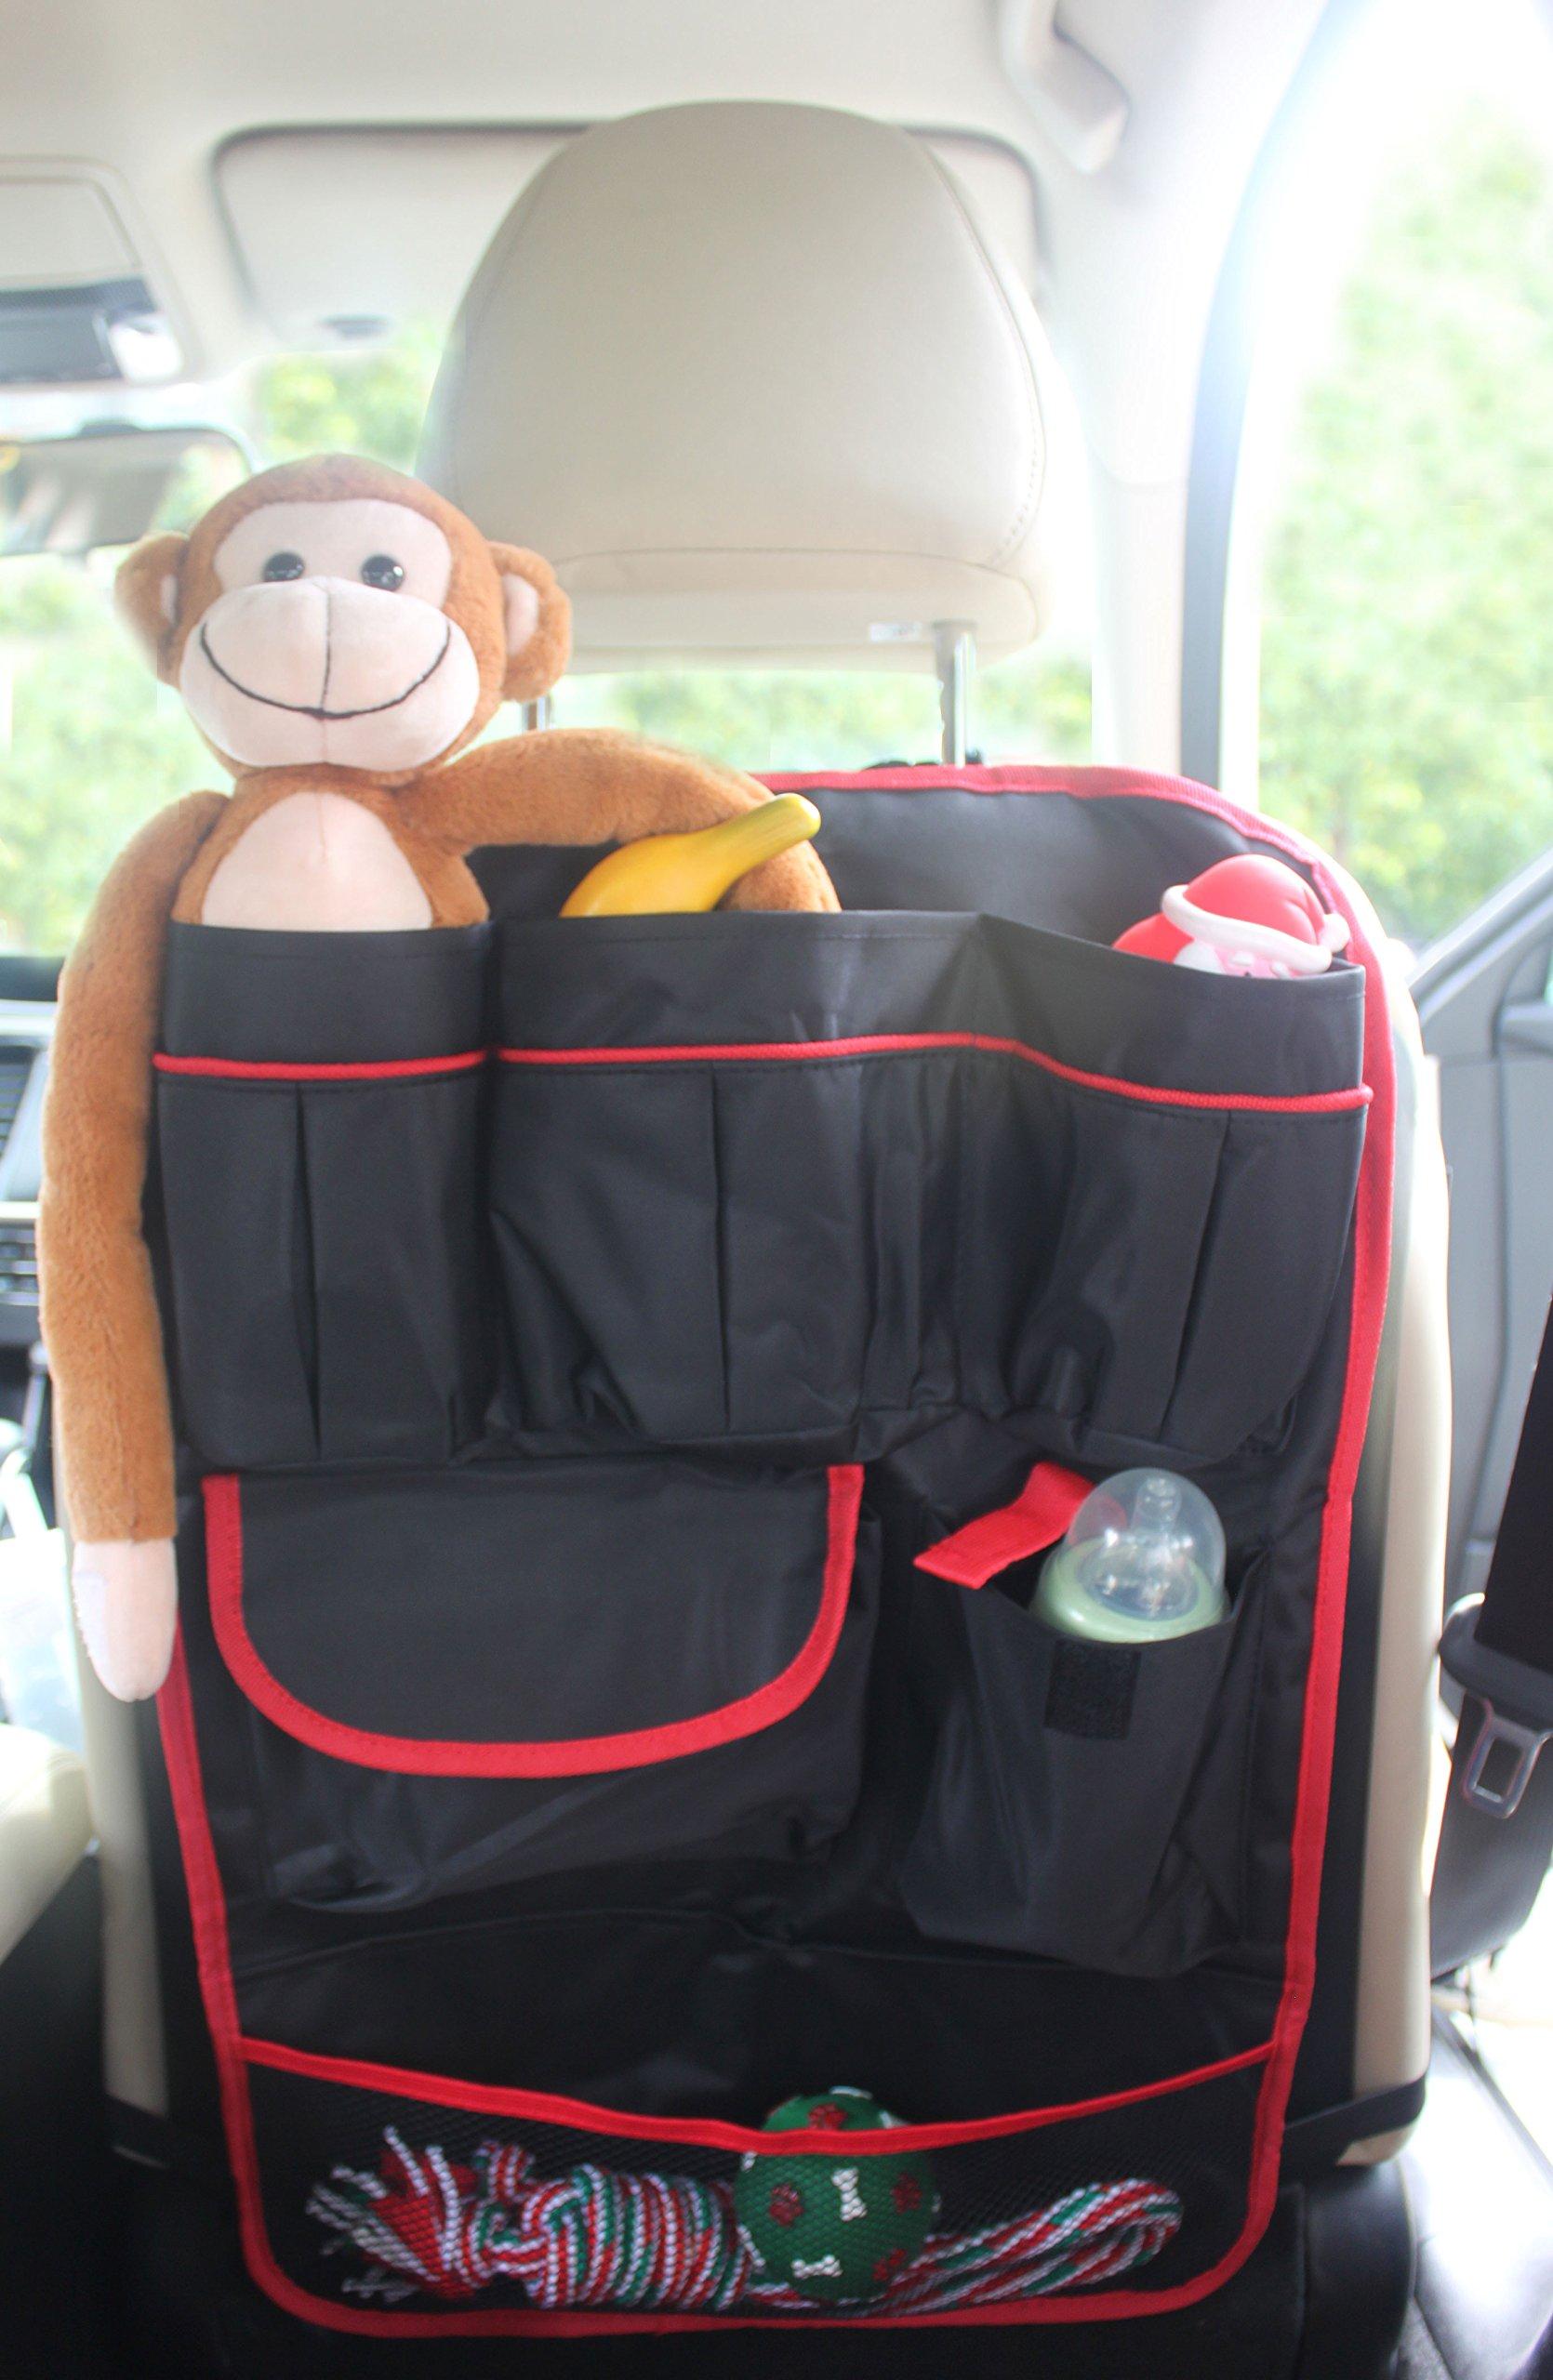 Durapower Backseat Car Organizer Kids Toy Storage & Baby Travel Accessories & Back Seat Protector/Kick Mat